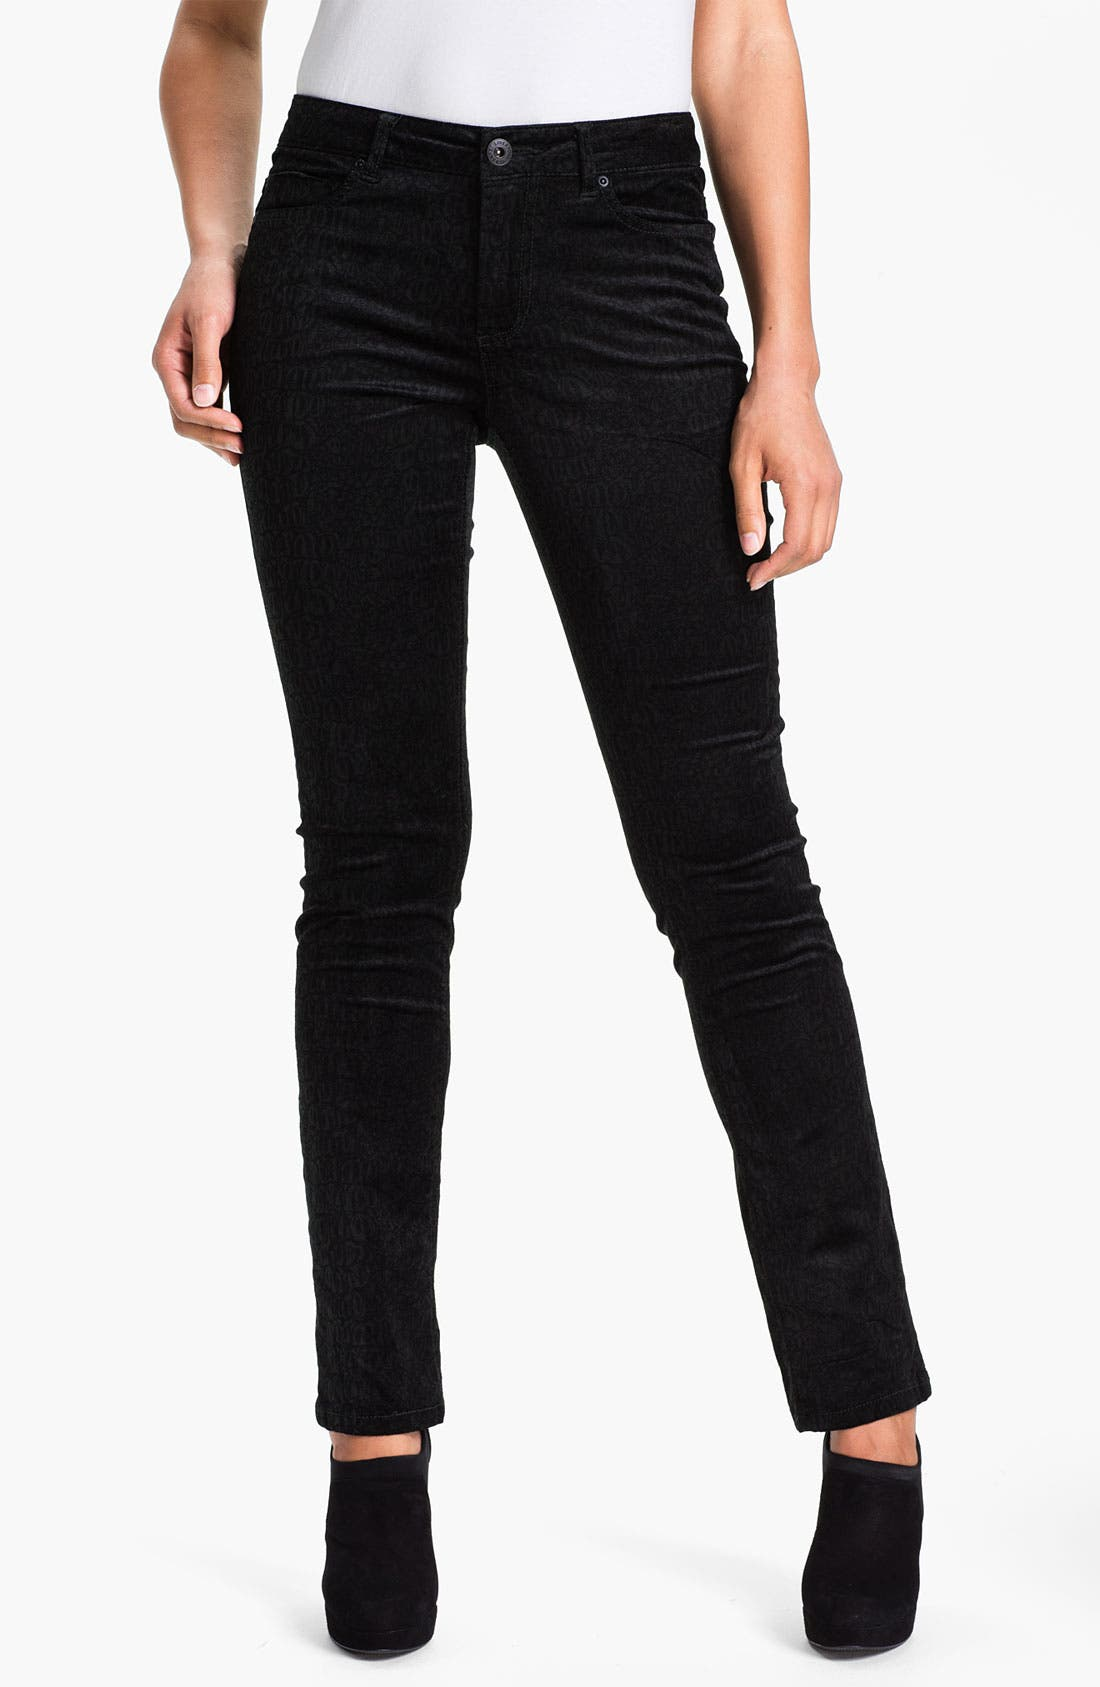 Alternate Image 1 Selected - Liverpool Jeans Company 'Sadie' - Cheetah' Straight Leg Velveteen Jeans